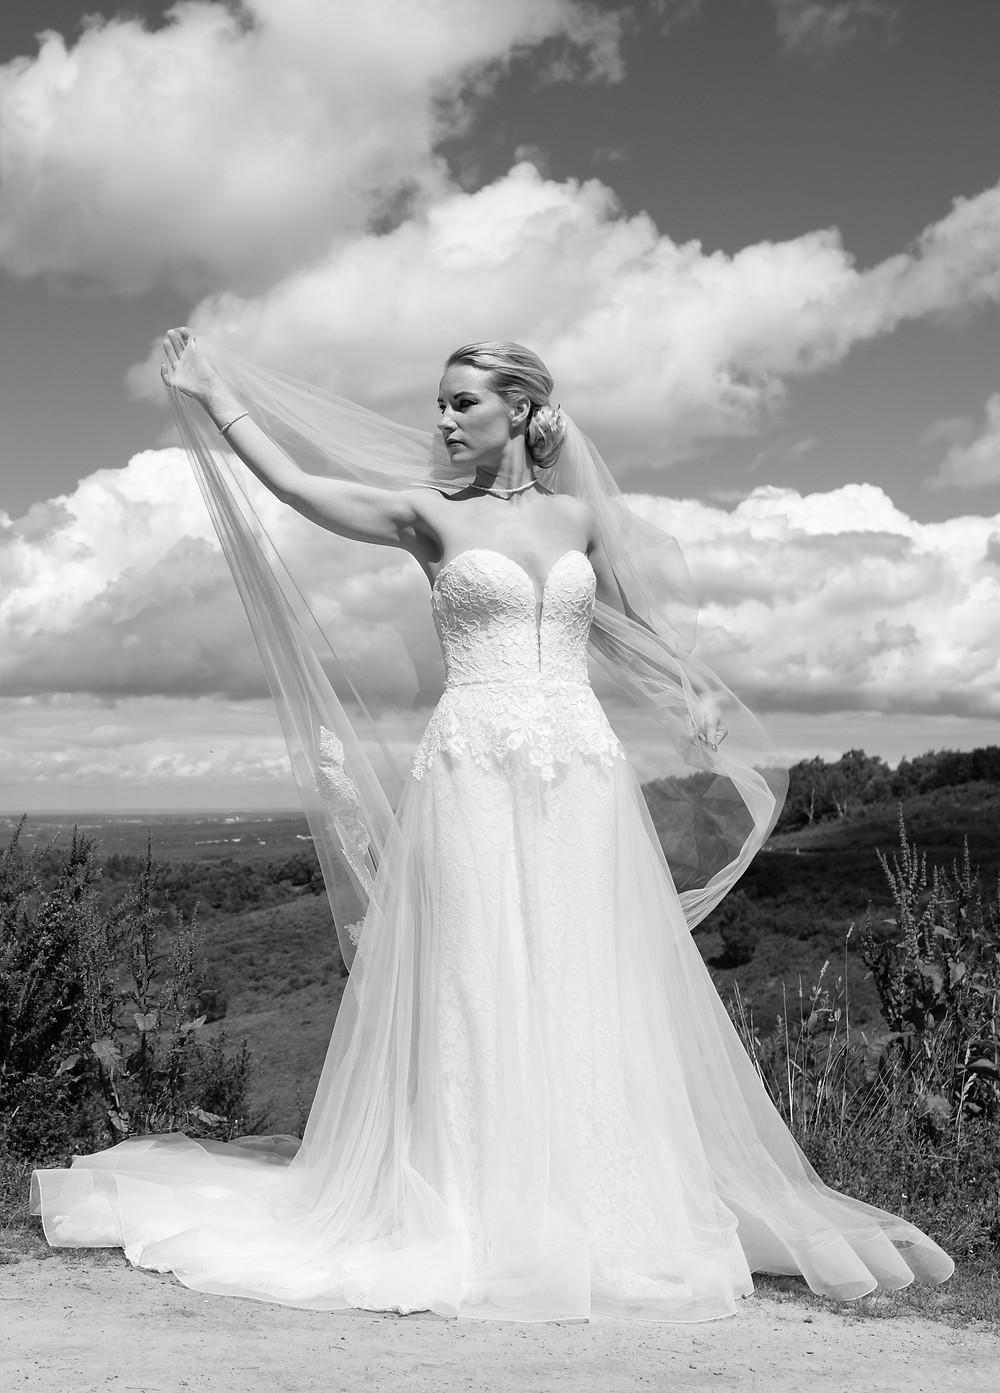 Mikaella dress 2152